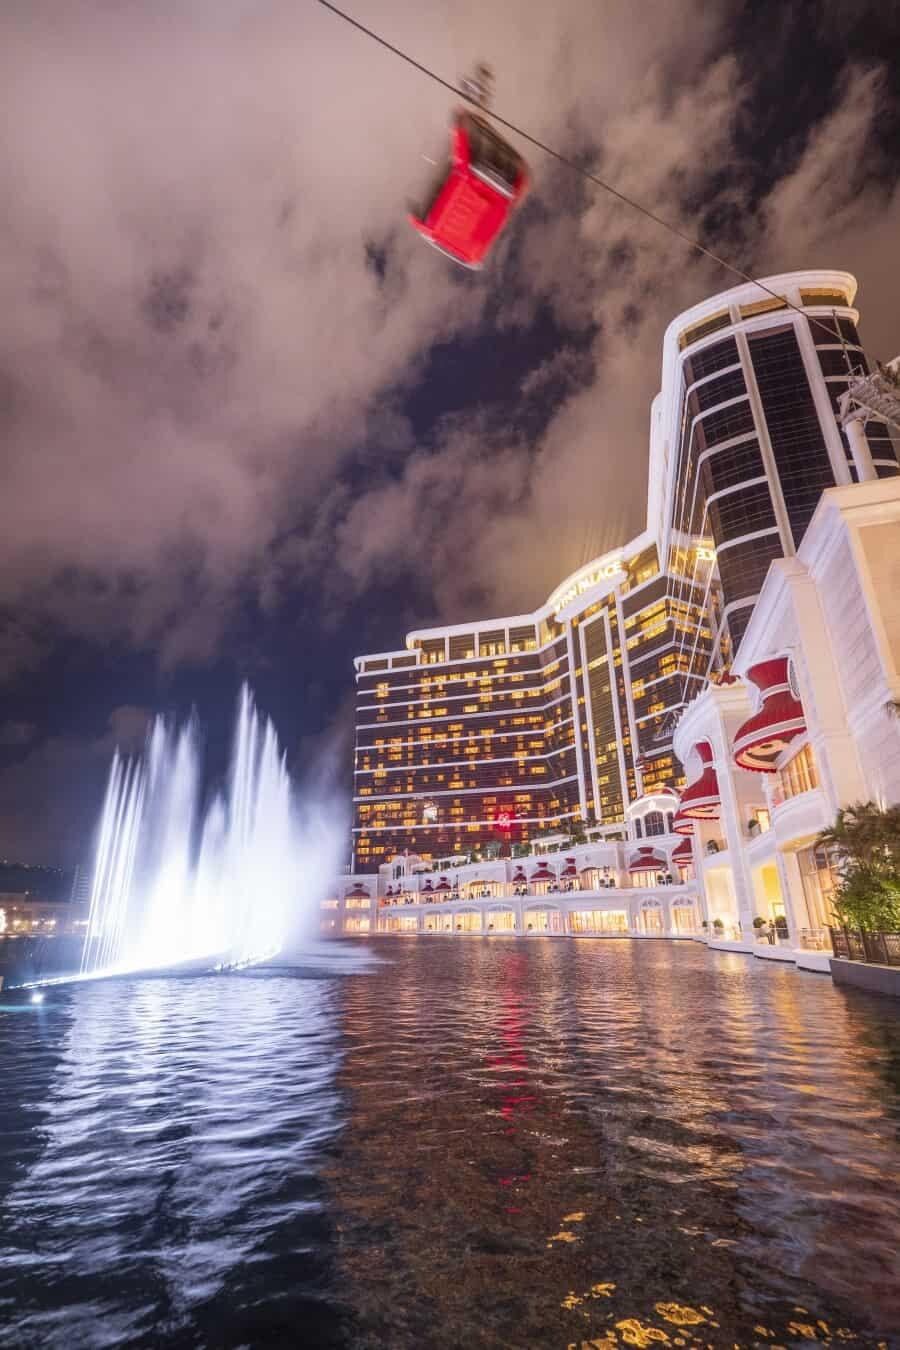 Wynn Macao Fountains - Macao photography locations